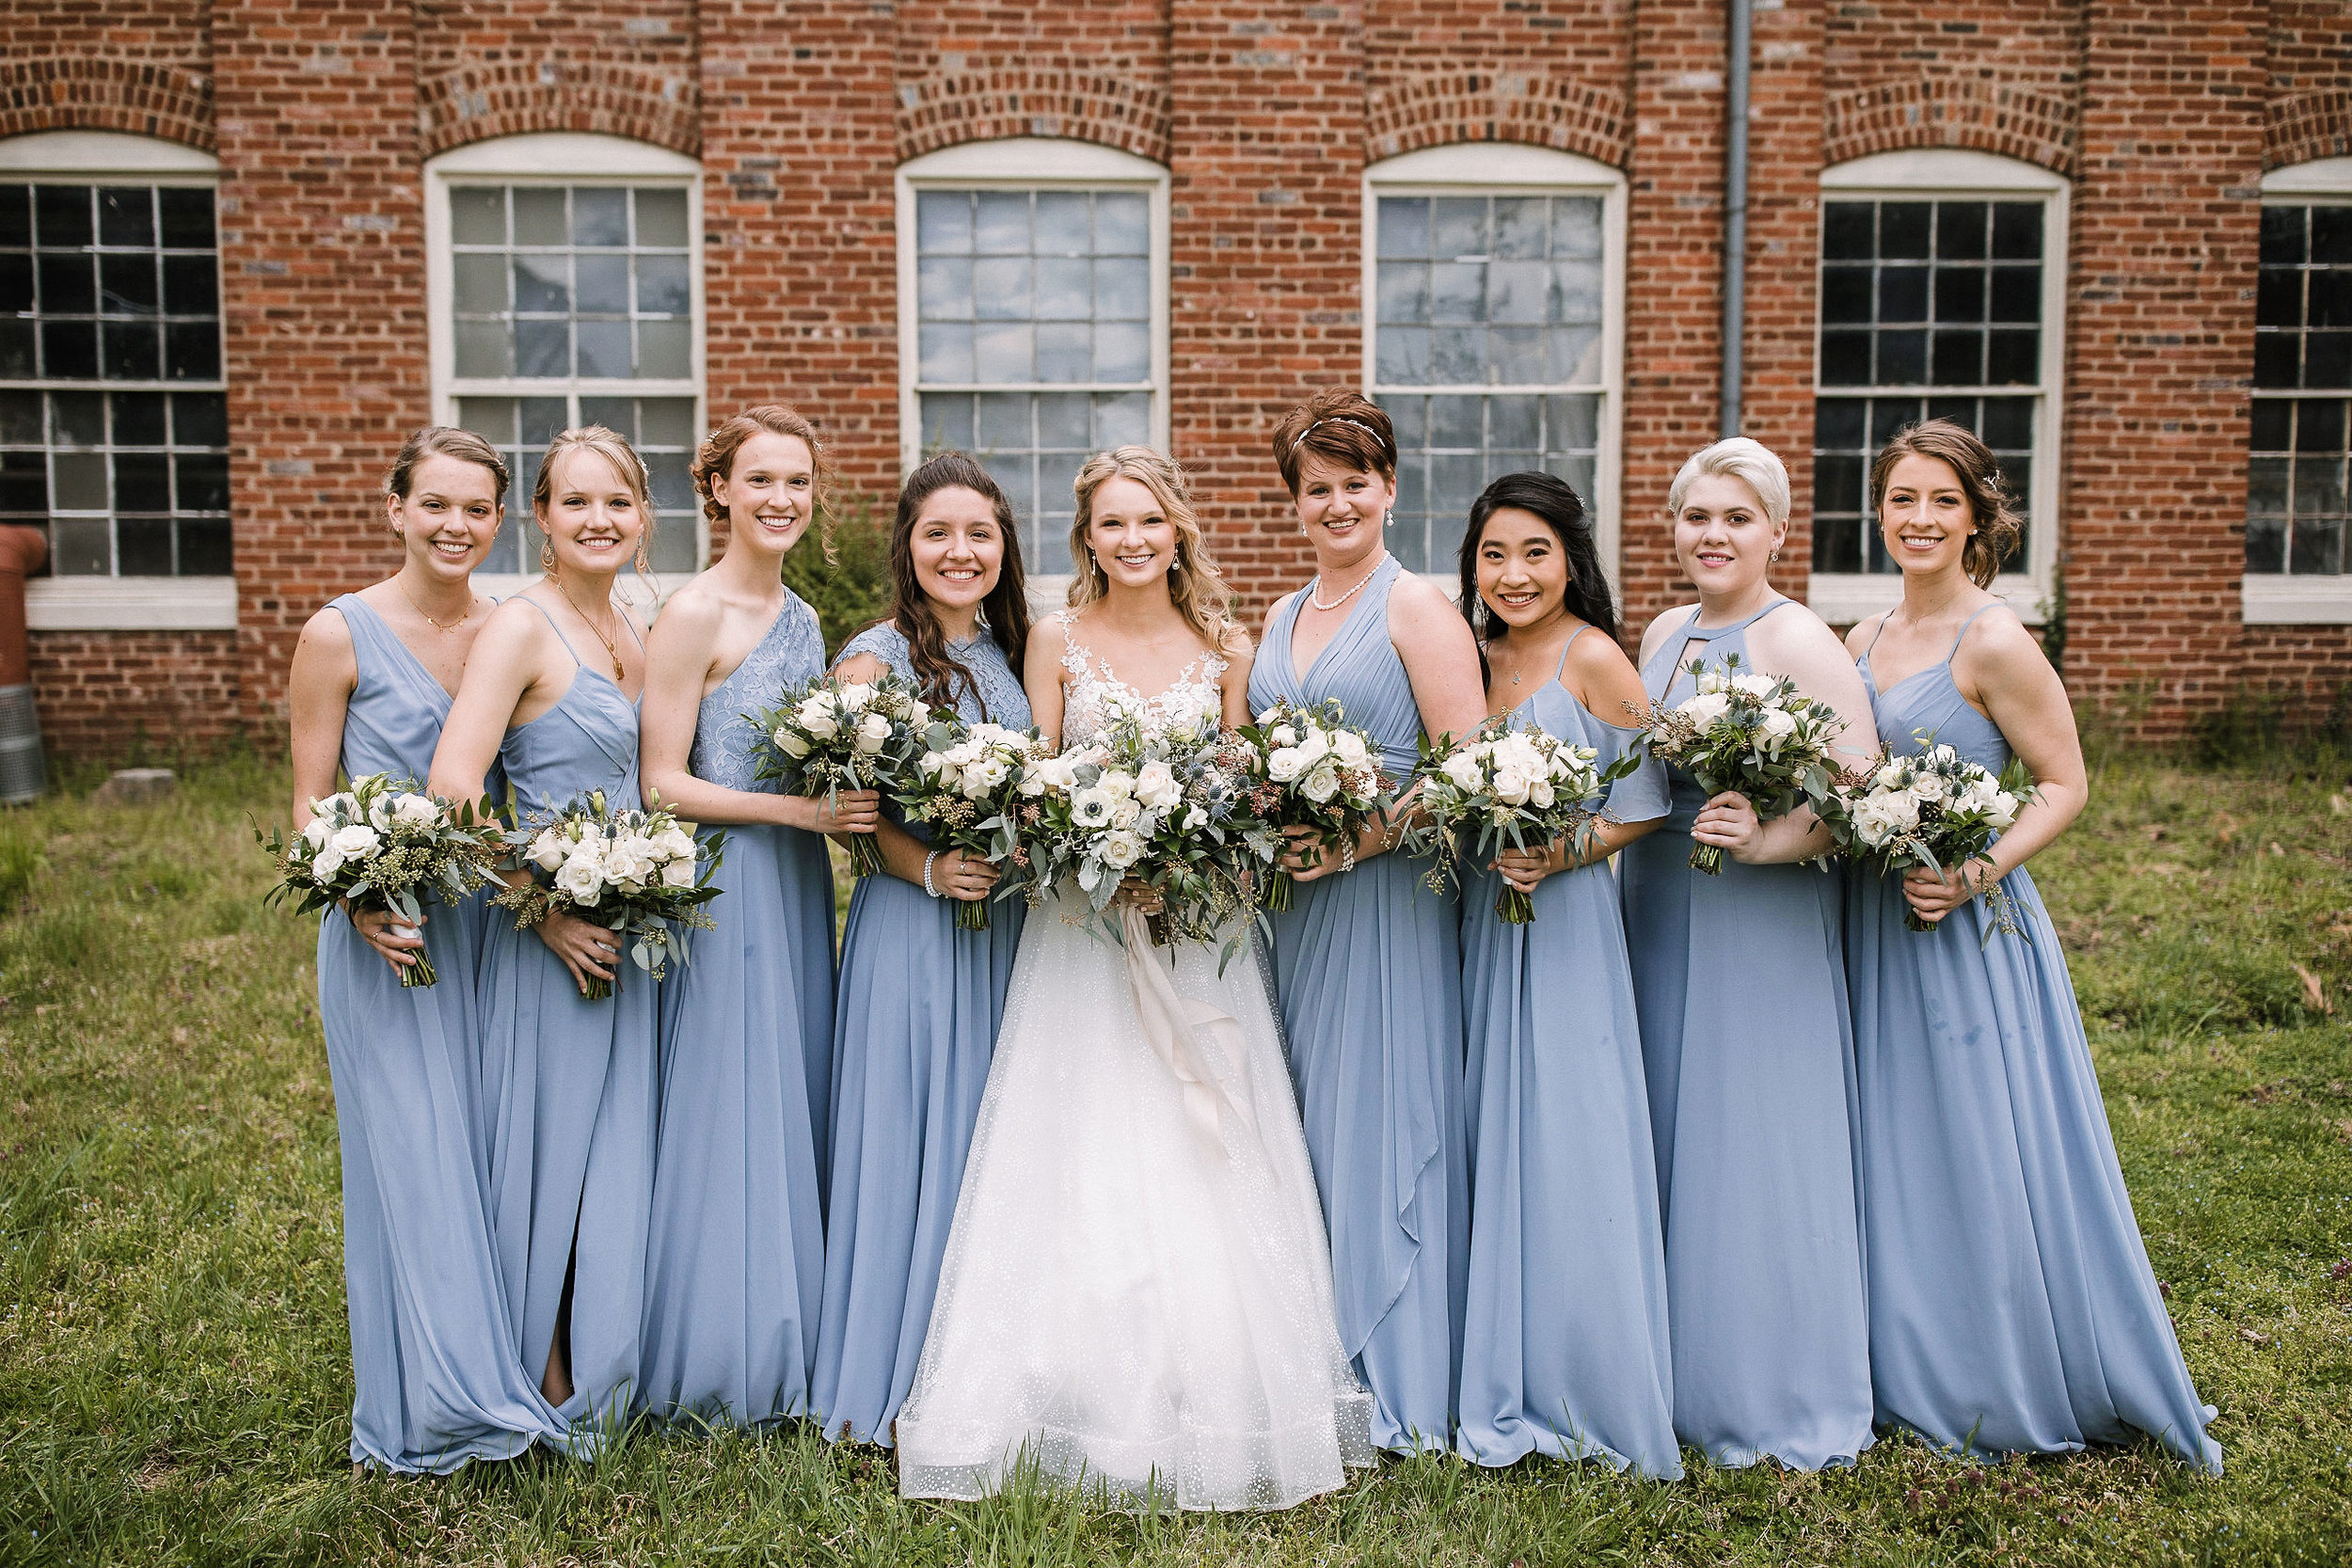 bride and bridesmaids posing at the Inn at the Old Silk Mill